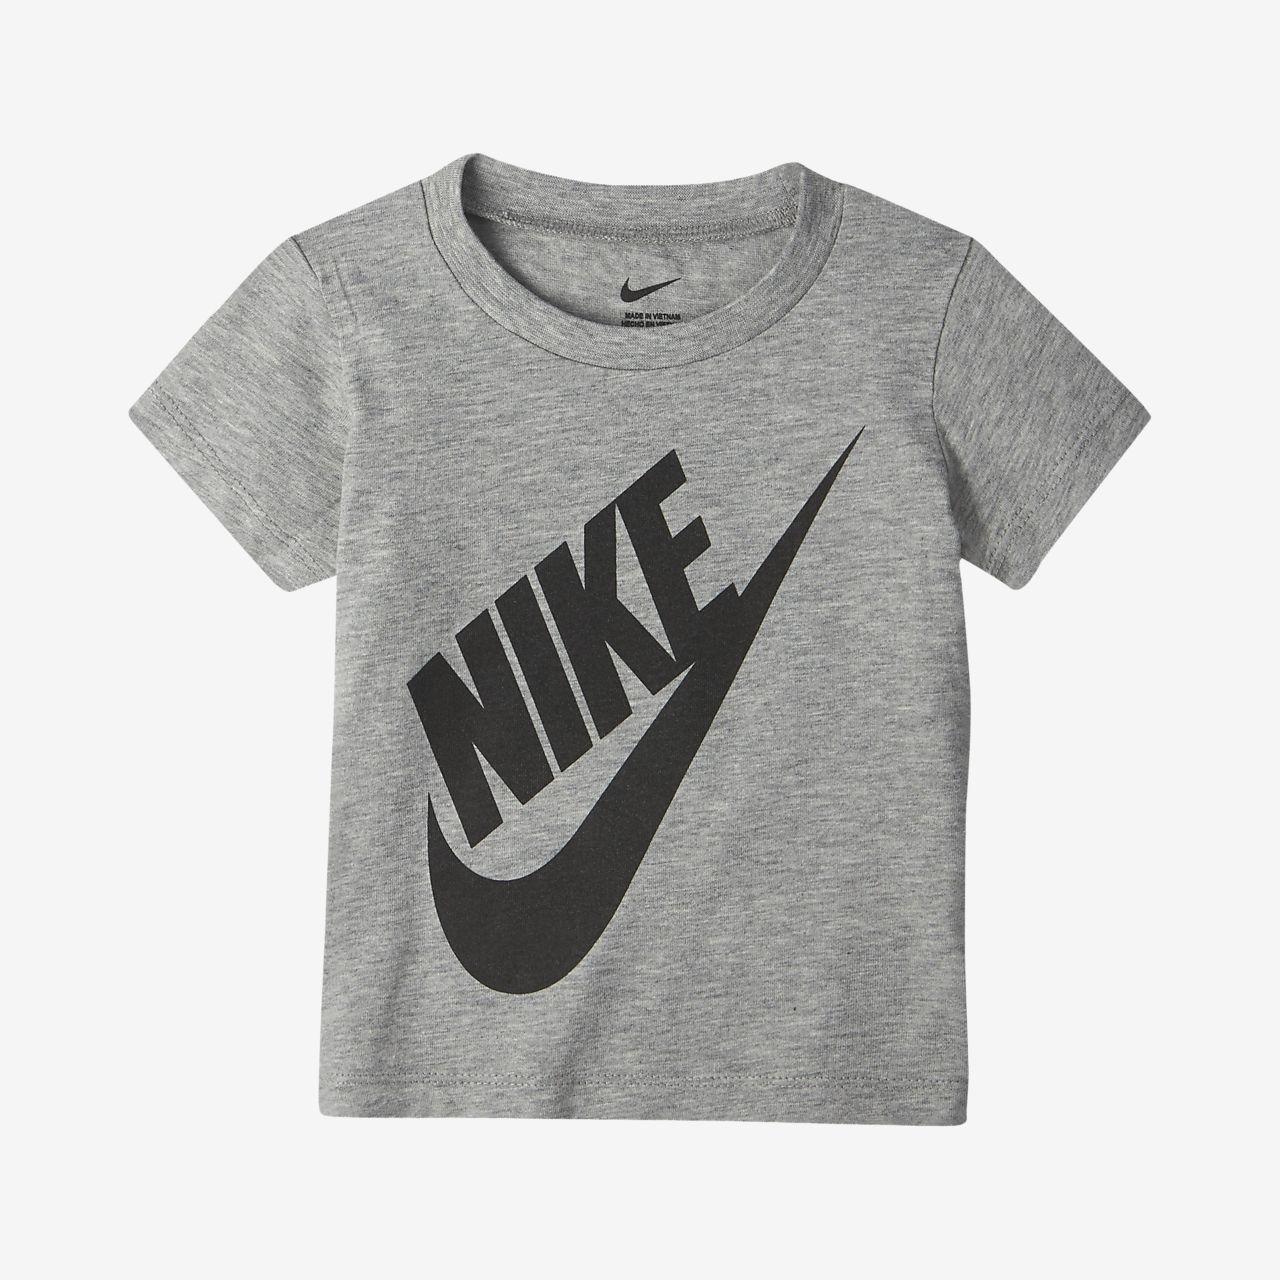 T-shirt Nike Sportswear för baby (12-24 mån)